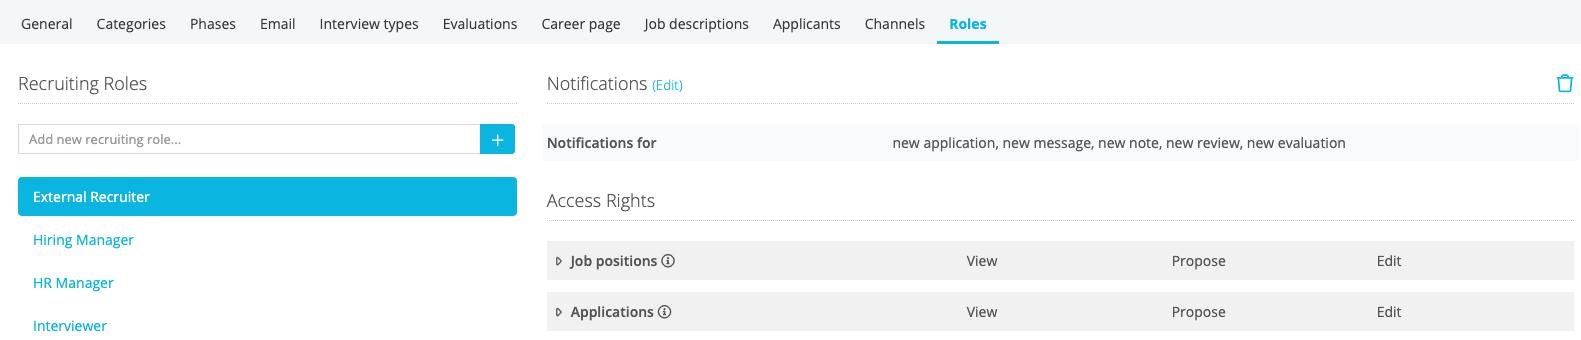 Recruiter-OptionB-Accessrights_en-us.png